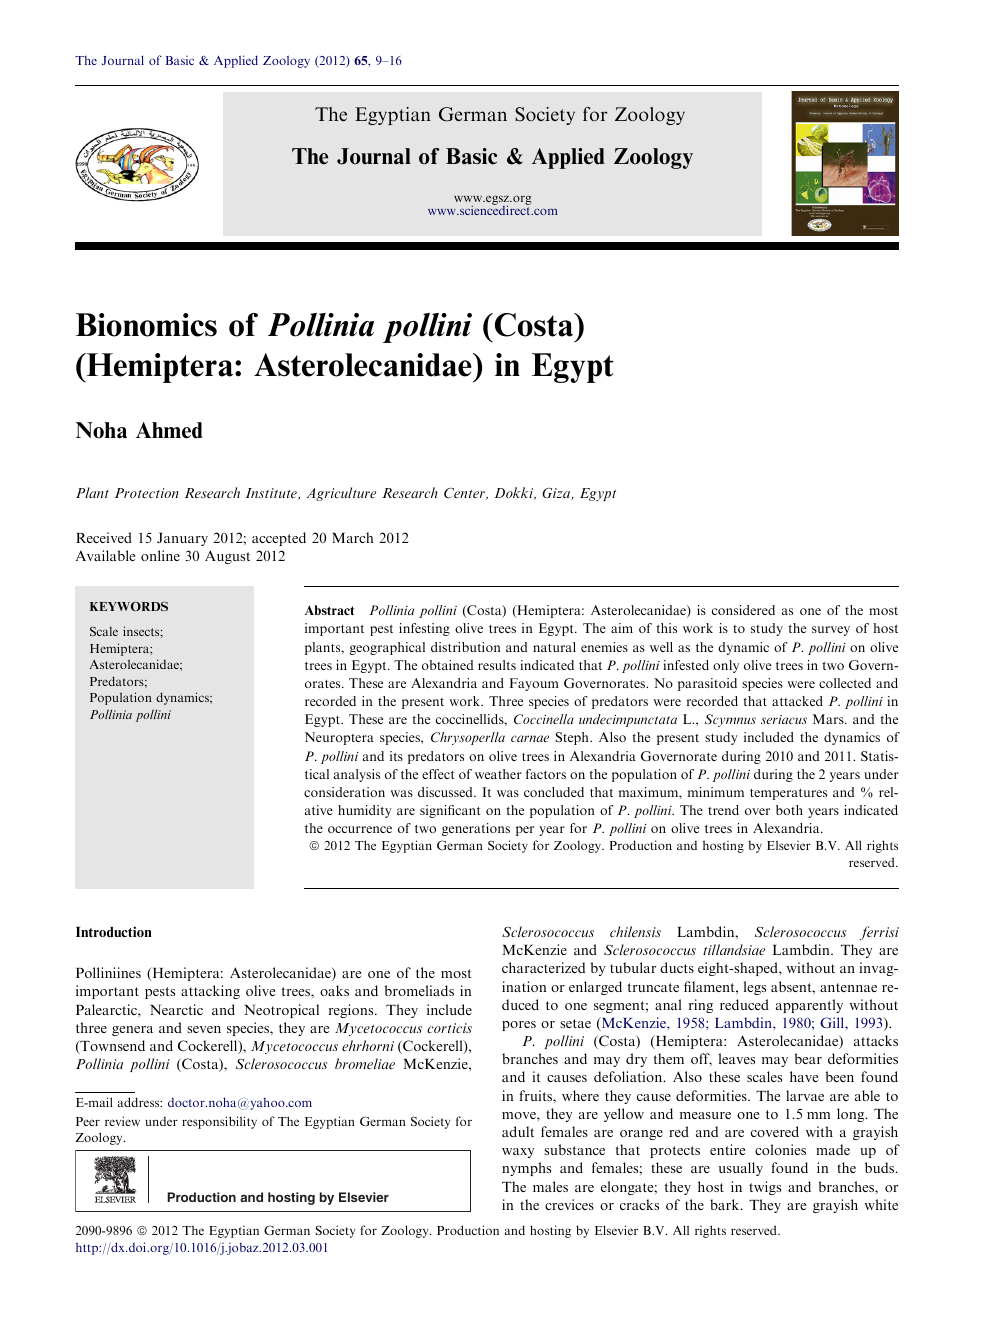 Bionomics of Pollinia pollini (Costa) (Hemiptera